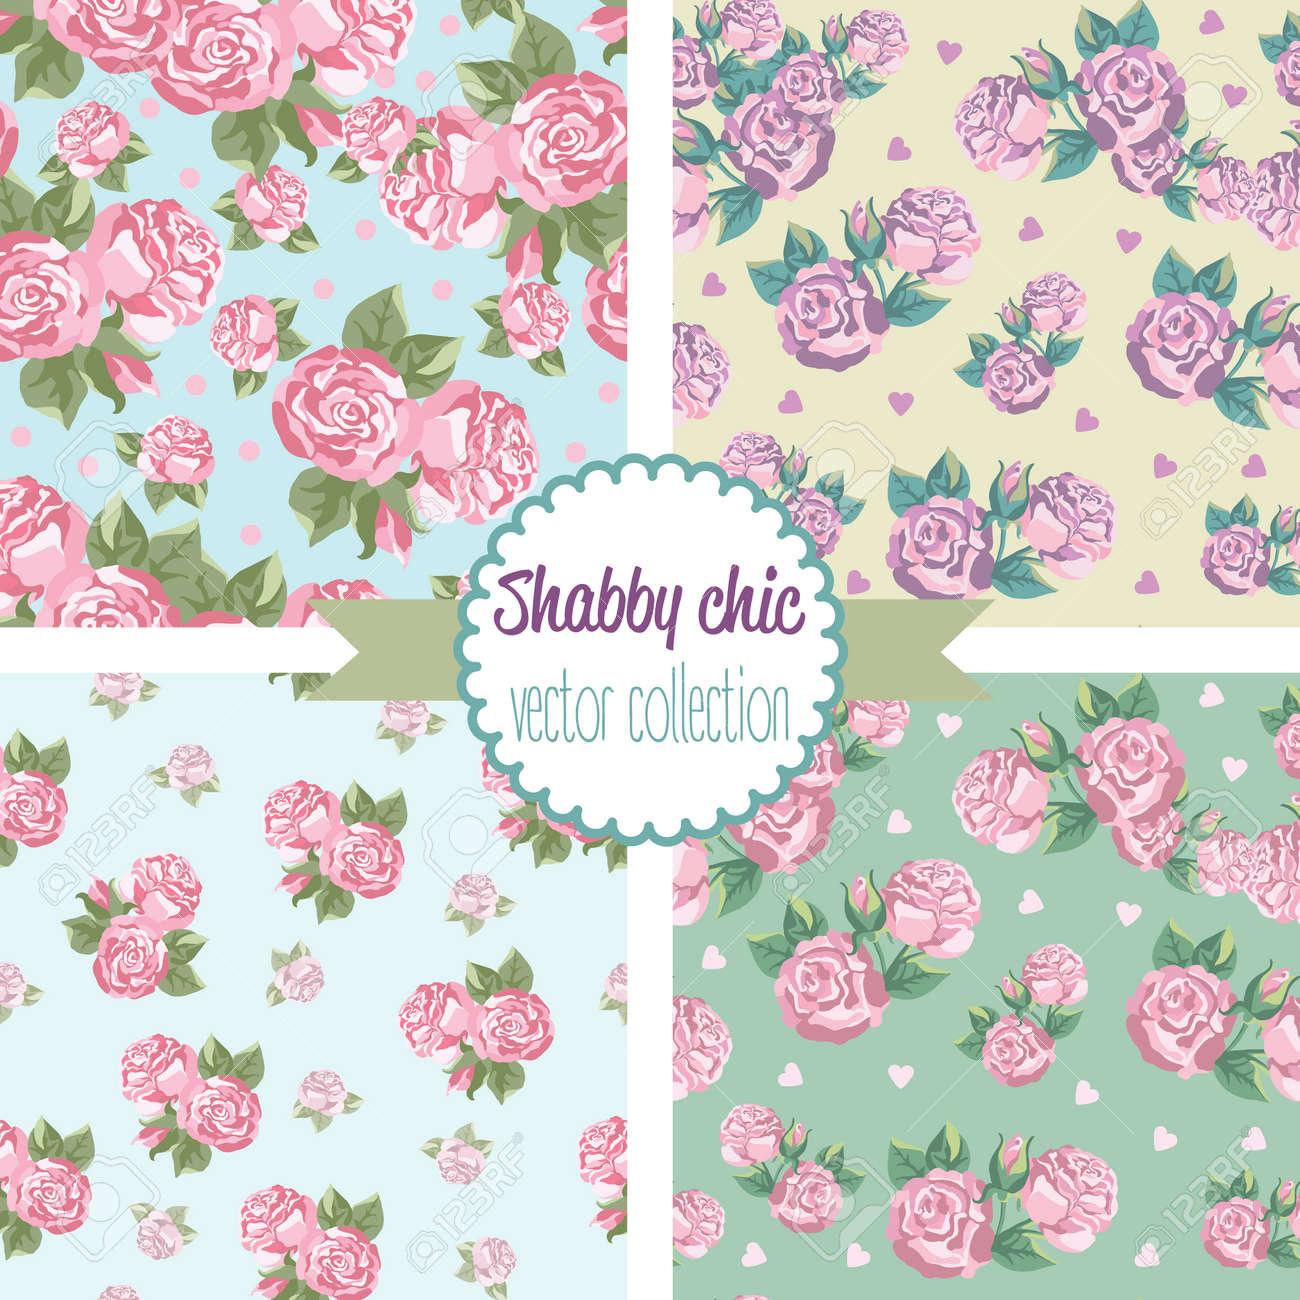 Shabby Chic Rose Patterns. Set seamless pattern. Vintage floral pattern, backgrounds. Vector illustration - 52022480